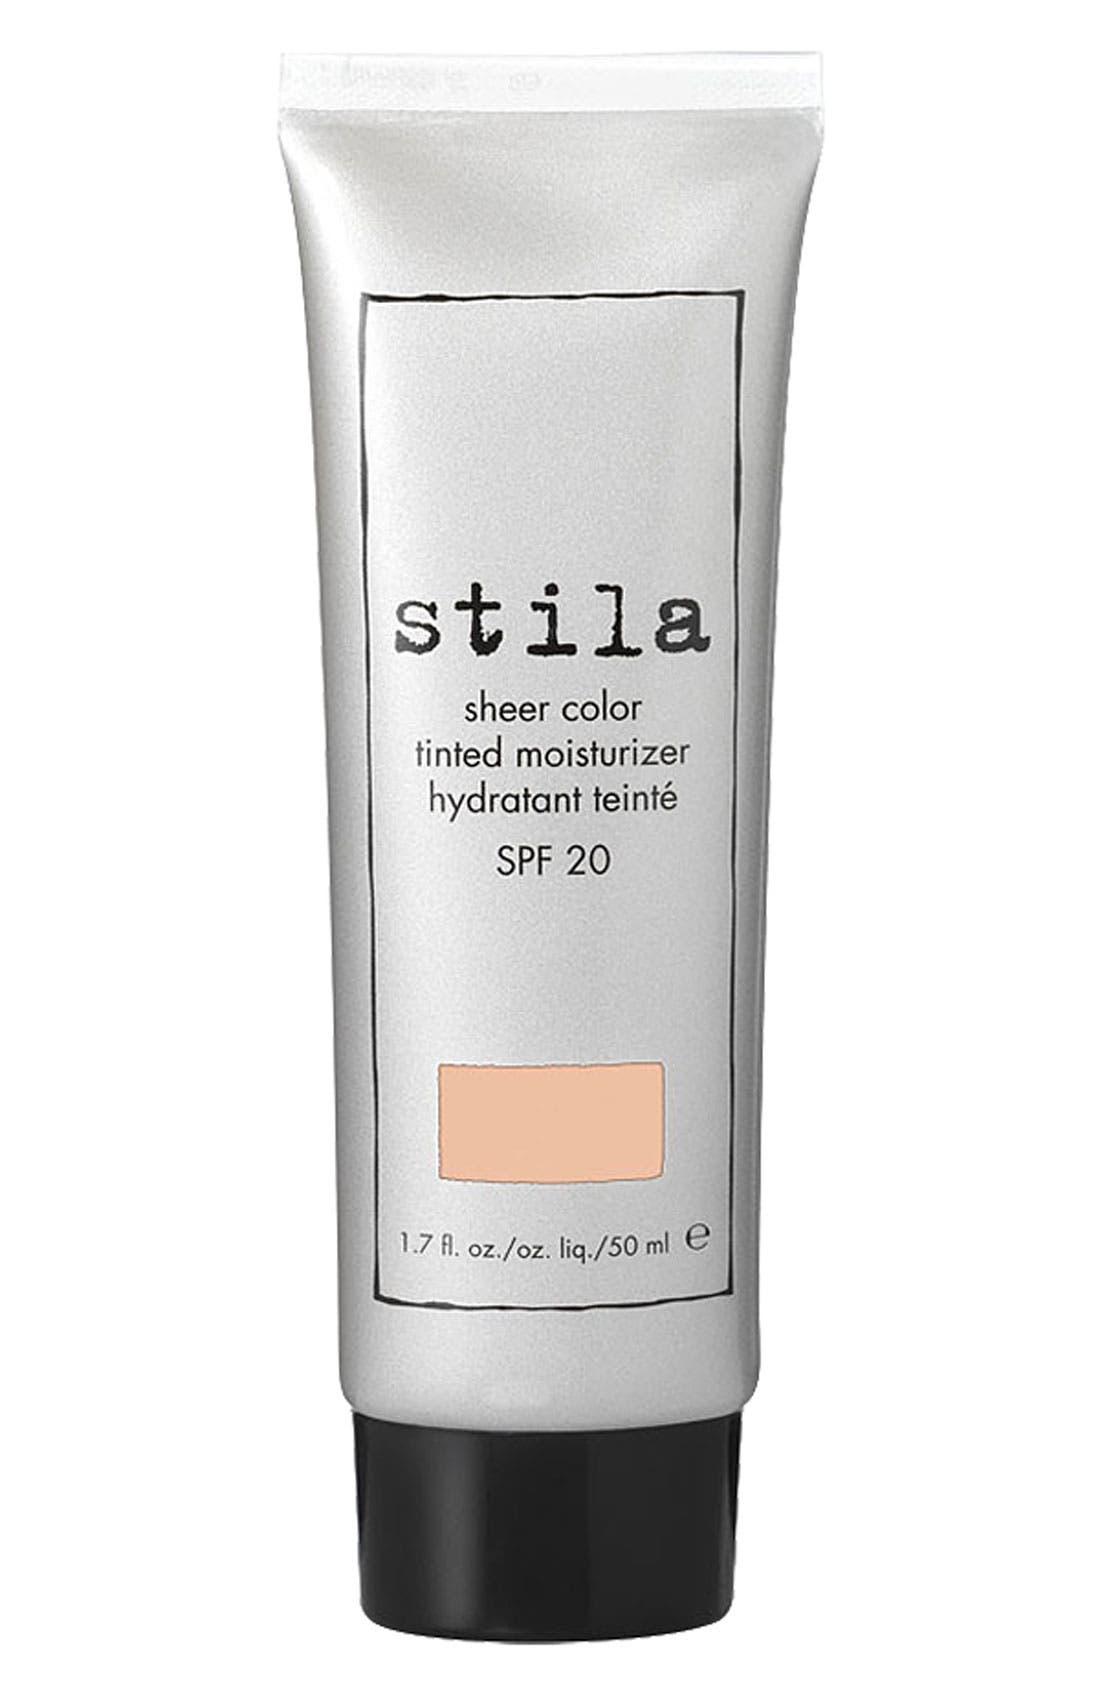 STILA, 'sheer color' tinted moisturizer SPF 20, Main thumbnail 1, color, 960